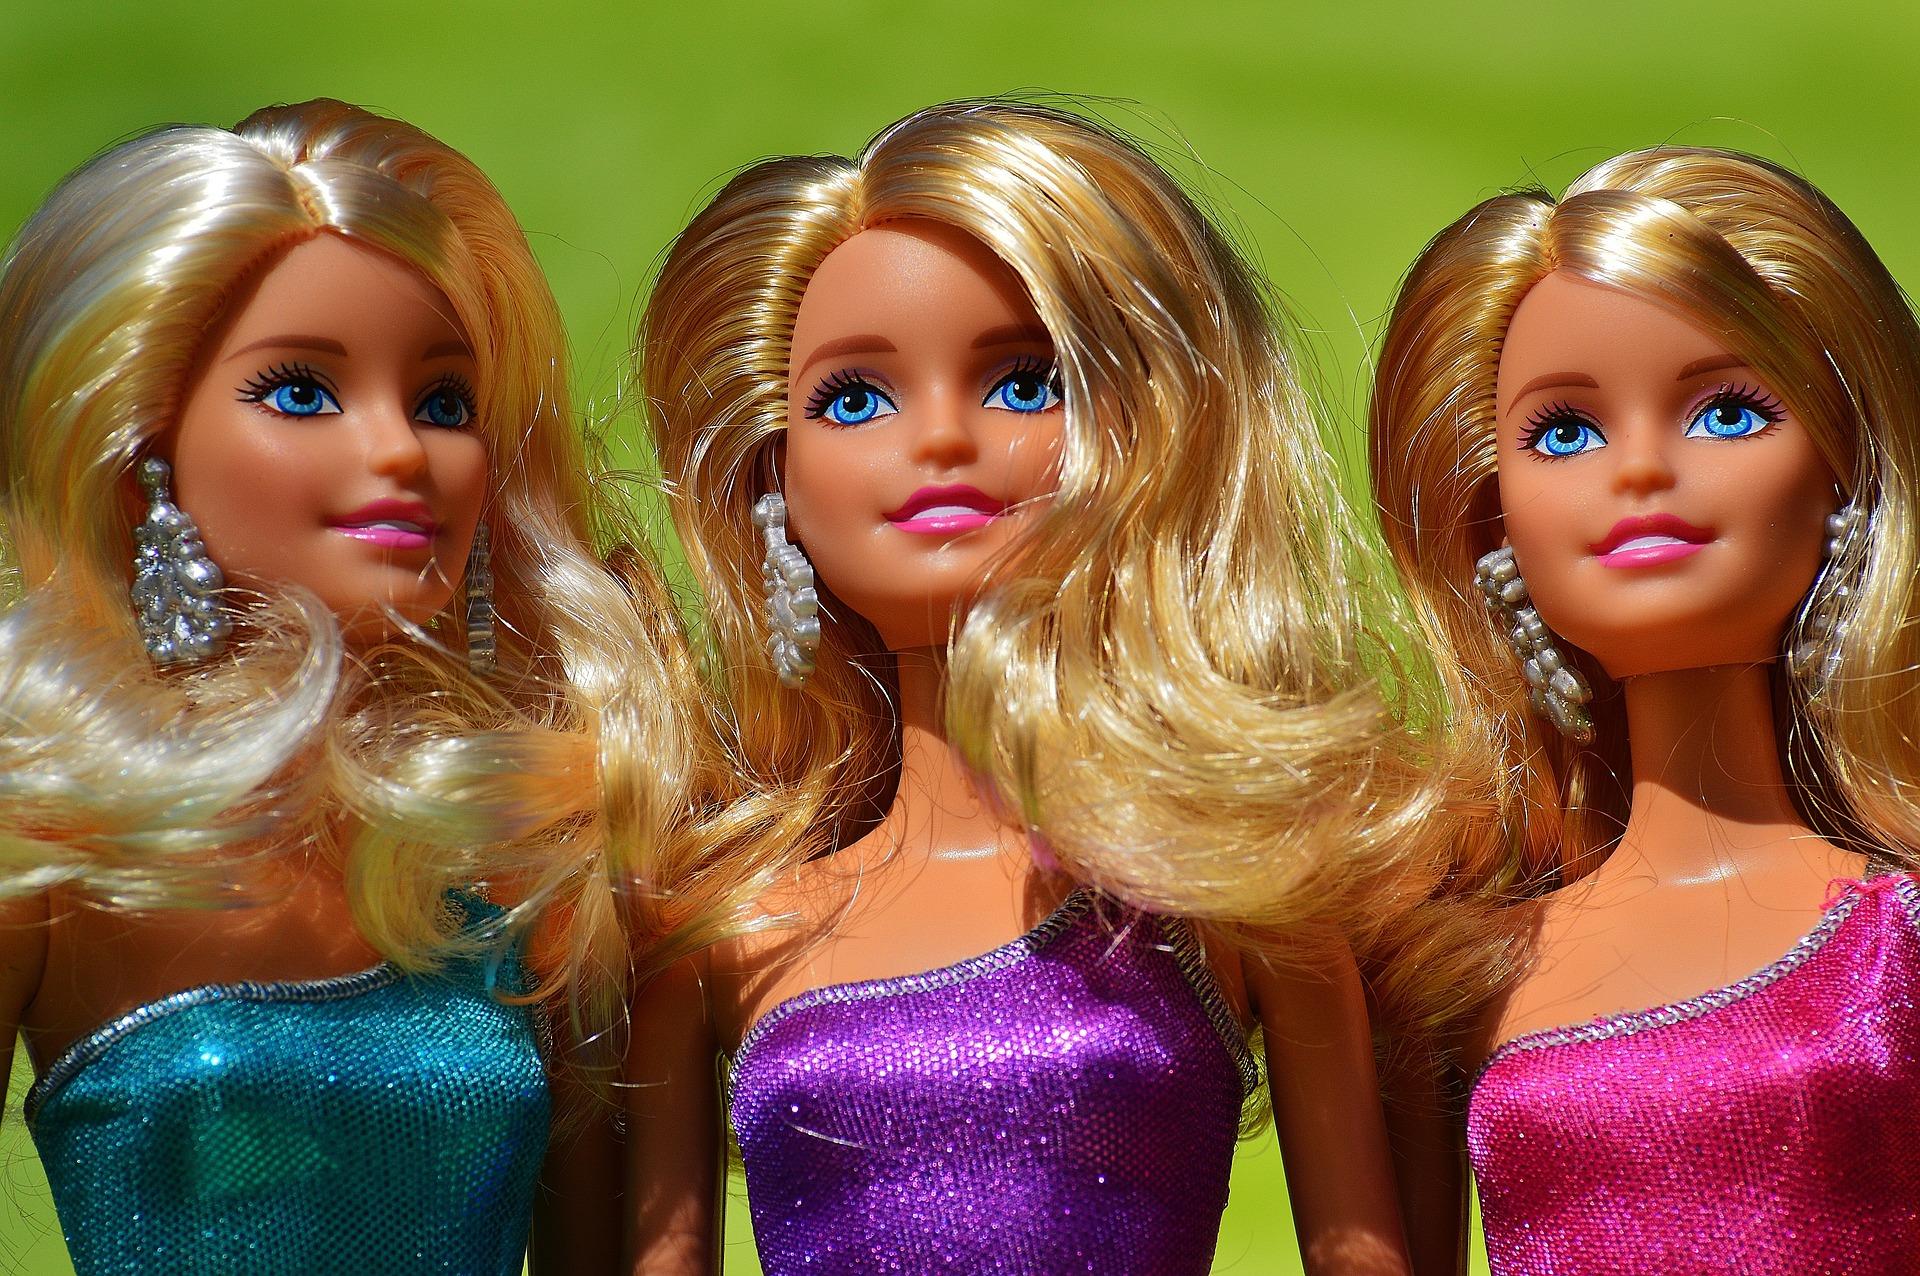 Barbie eleganti Foto di 🎄Merry Christmas 🎄 da Pixabay